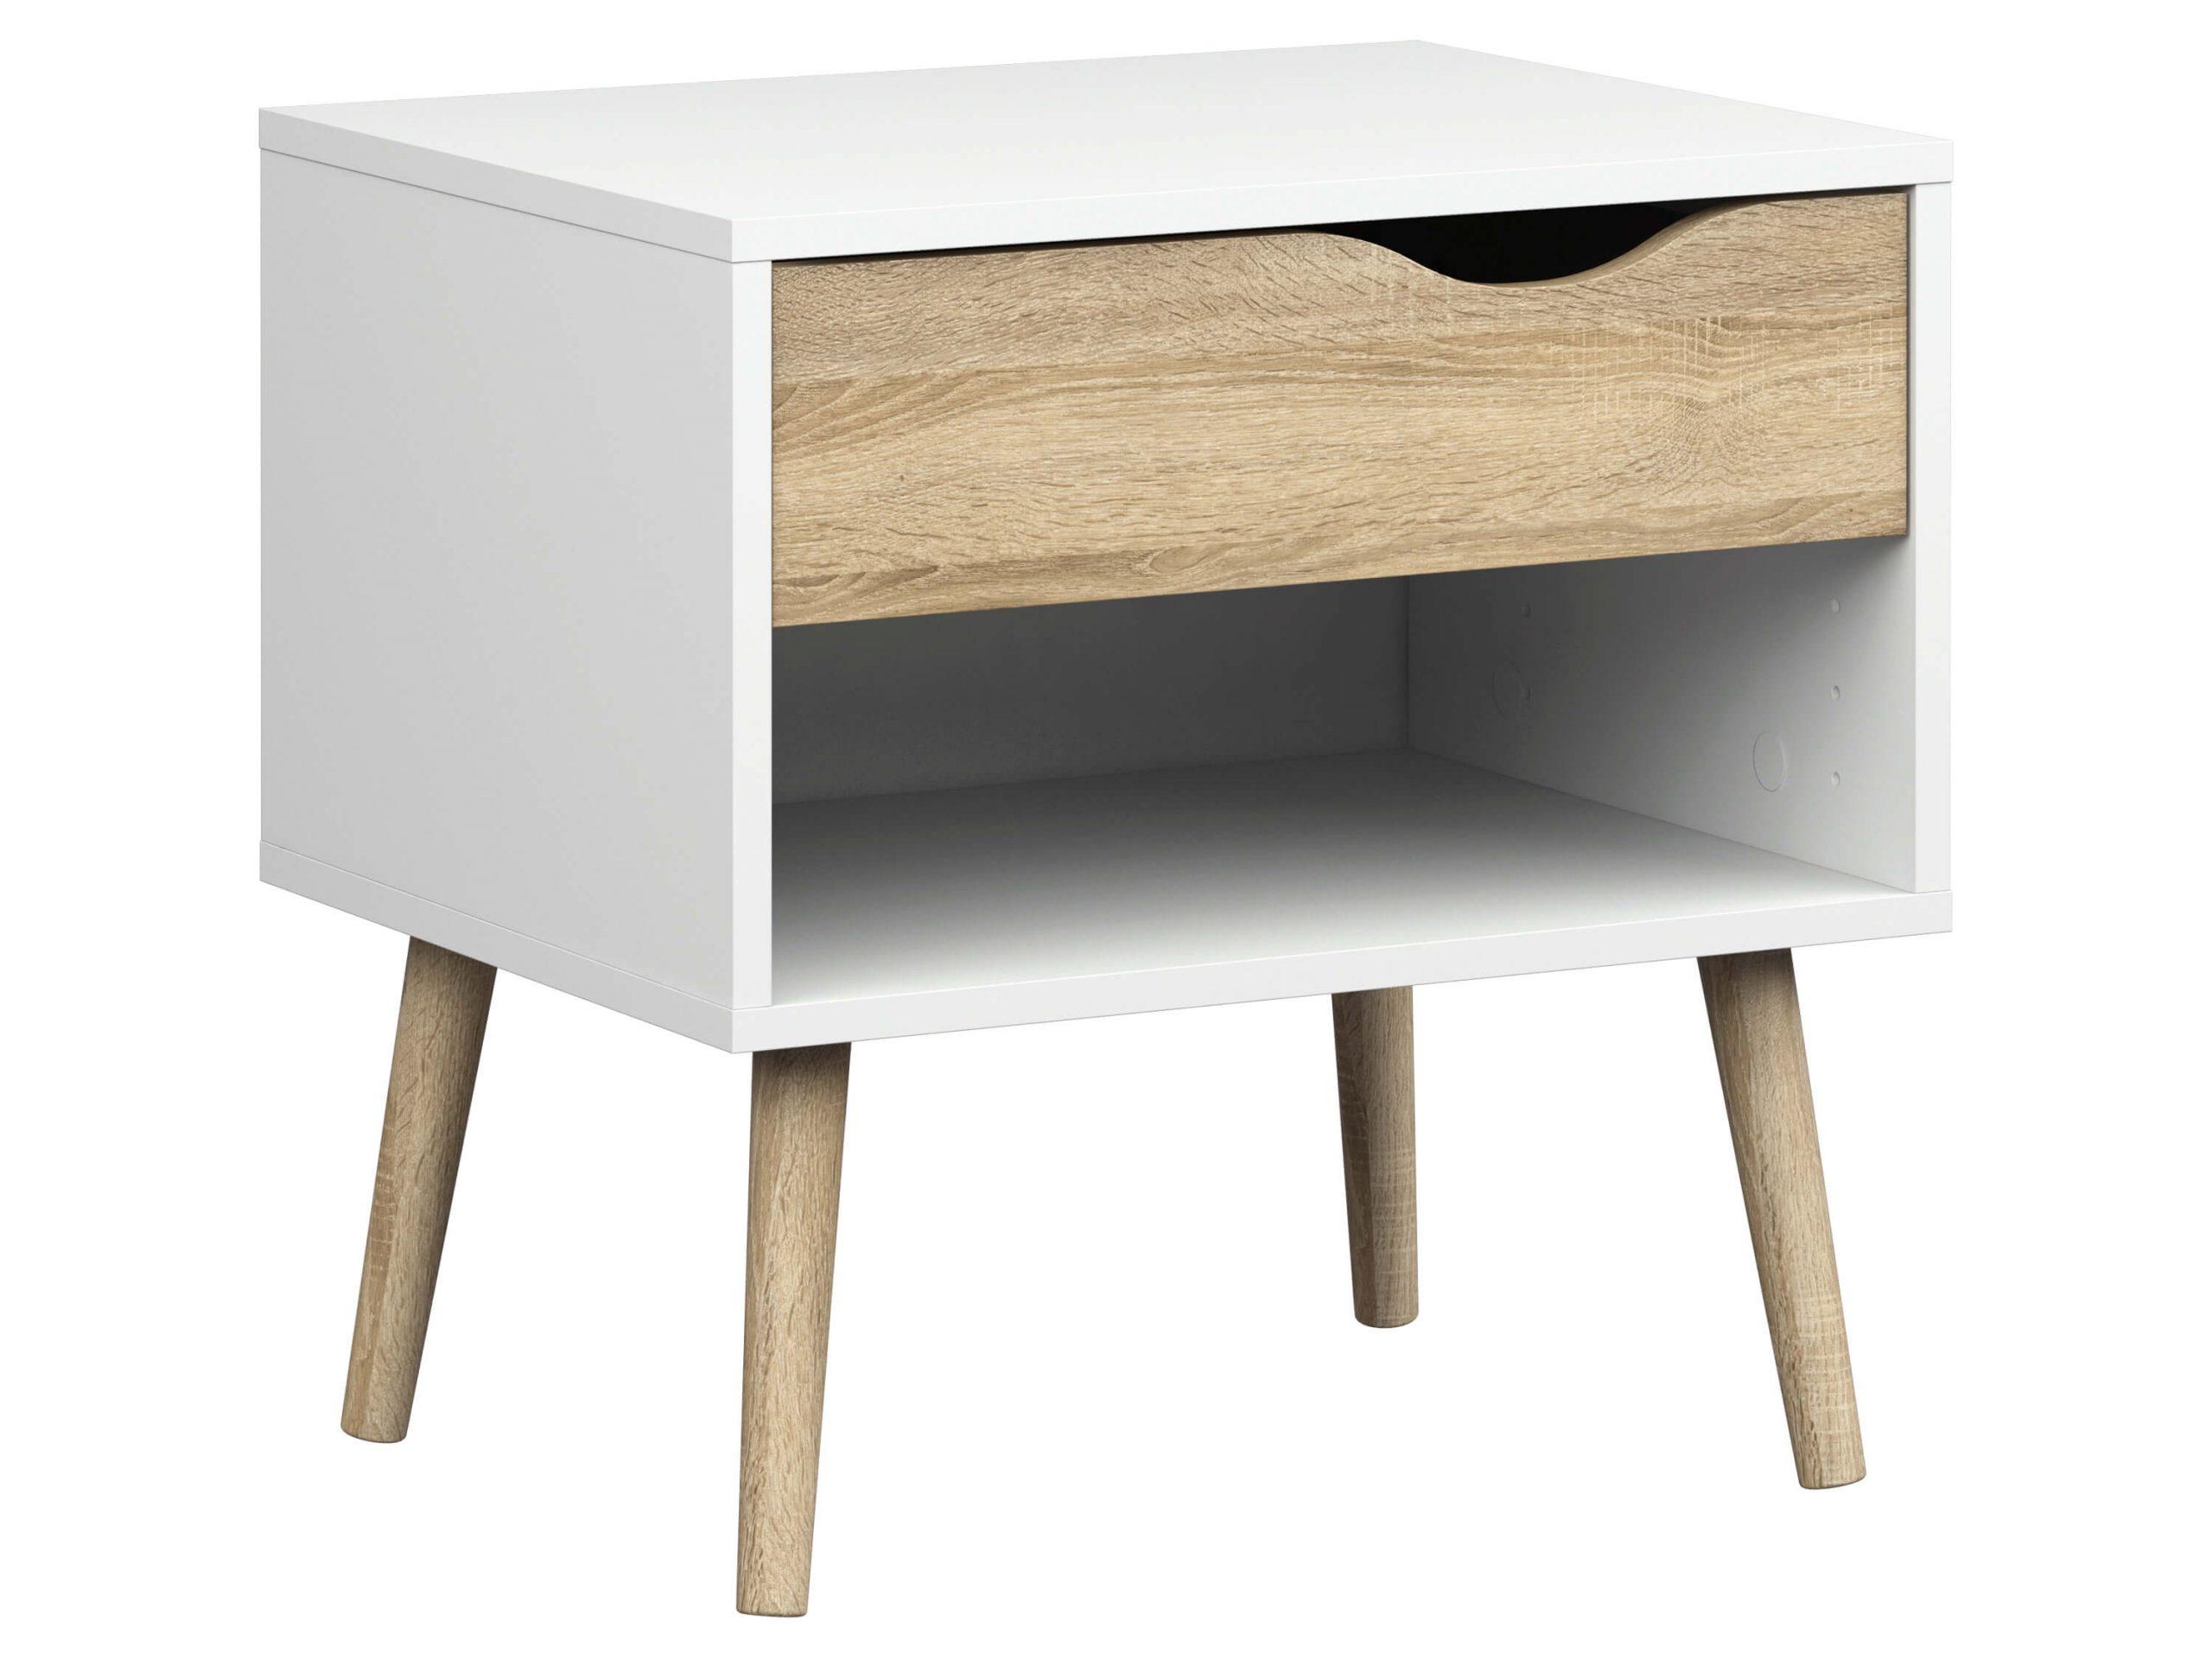 Delta natbord – skandinavisk minimalisme